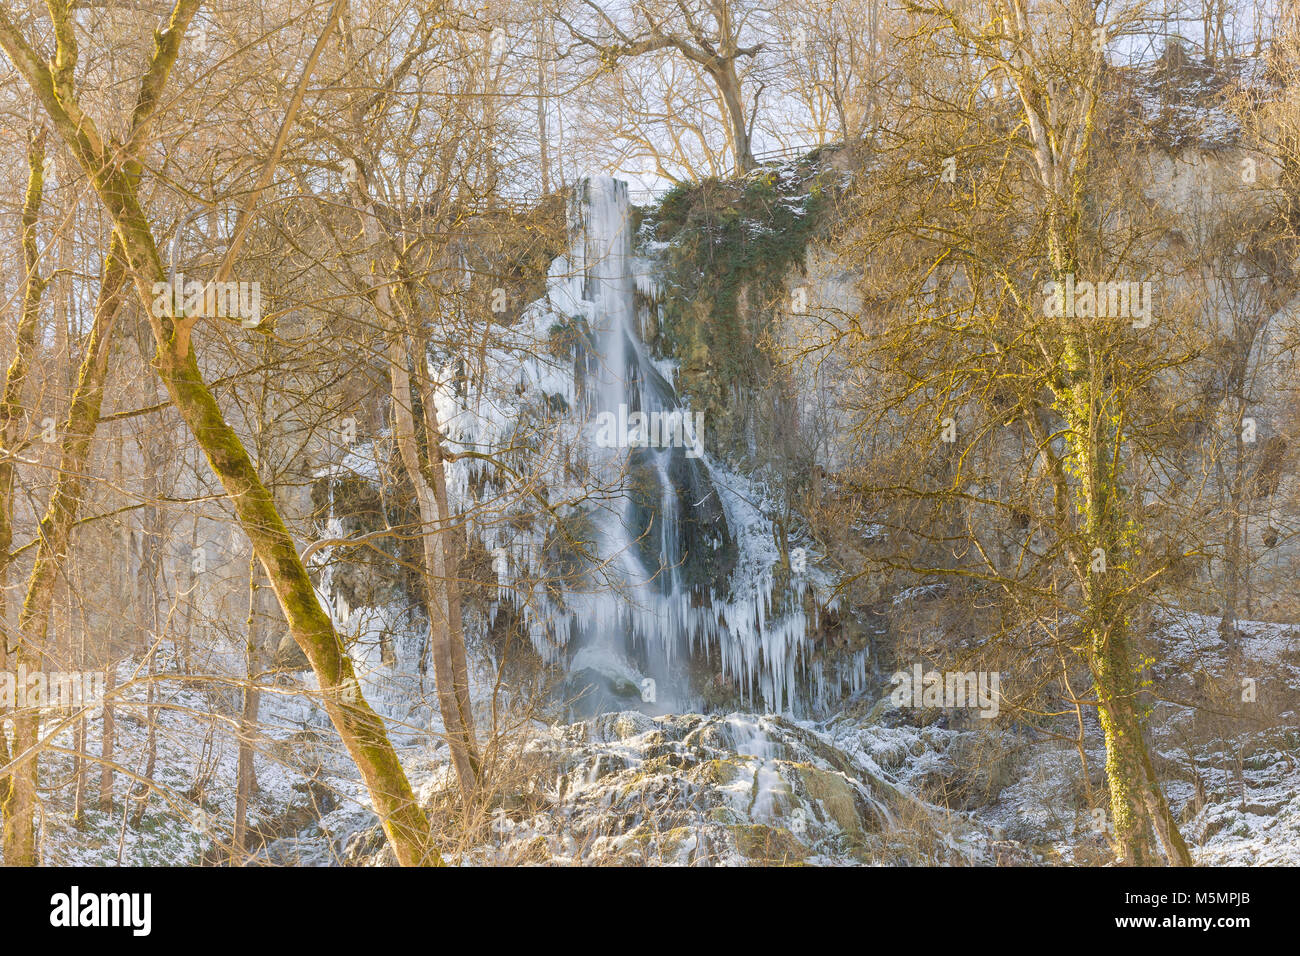 Uracher Wasserfall in winter - Stock Image